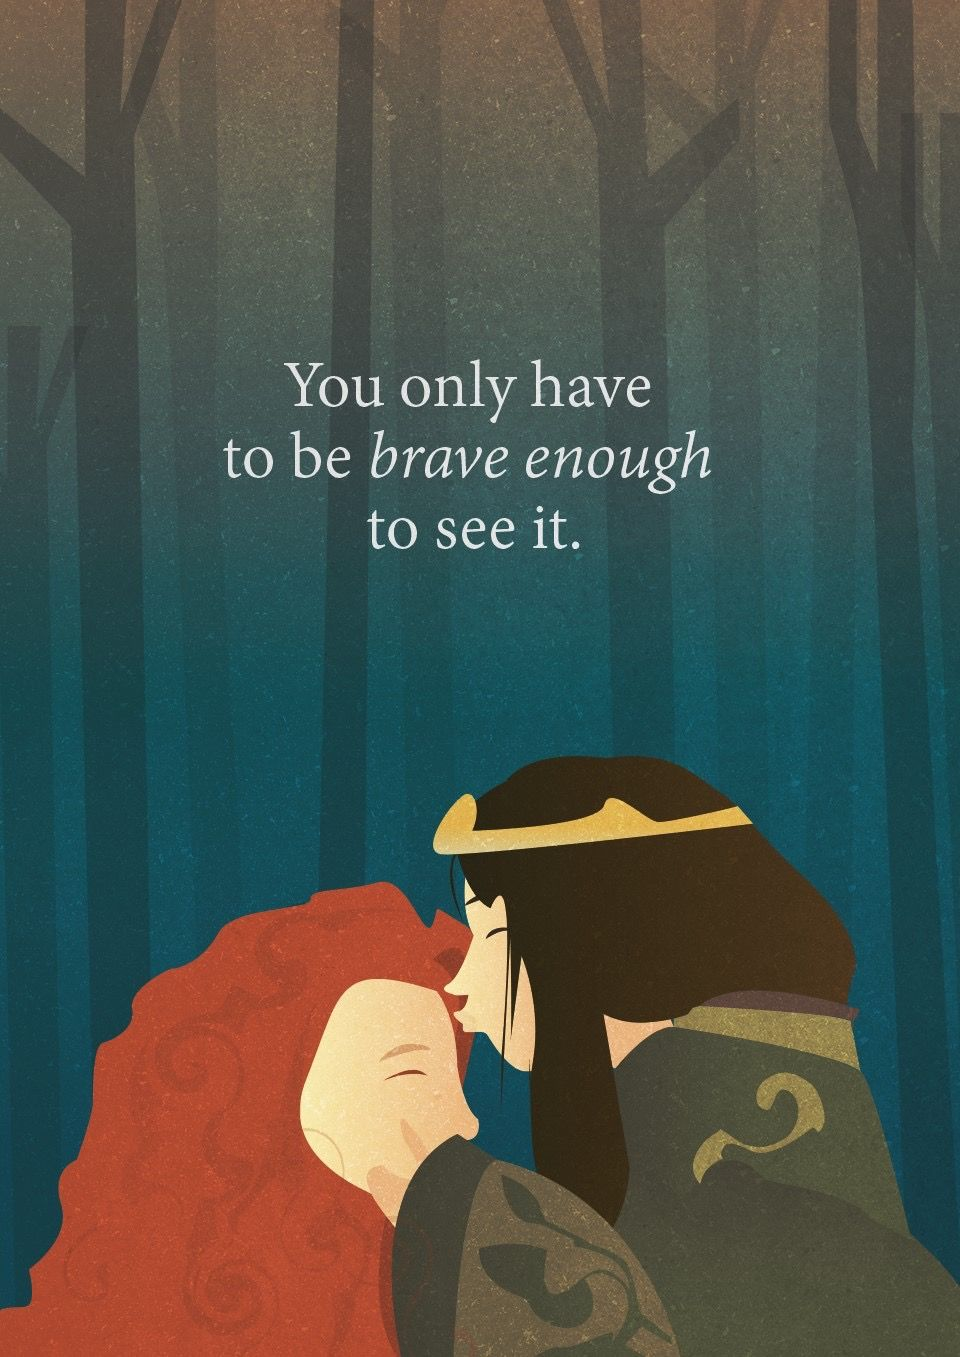 Pin By Chimdi Isiguzo On Prints Disney Quotes Quotes Disney Disney Brave